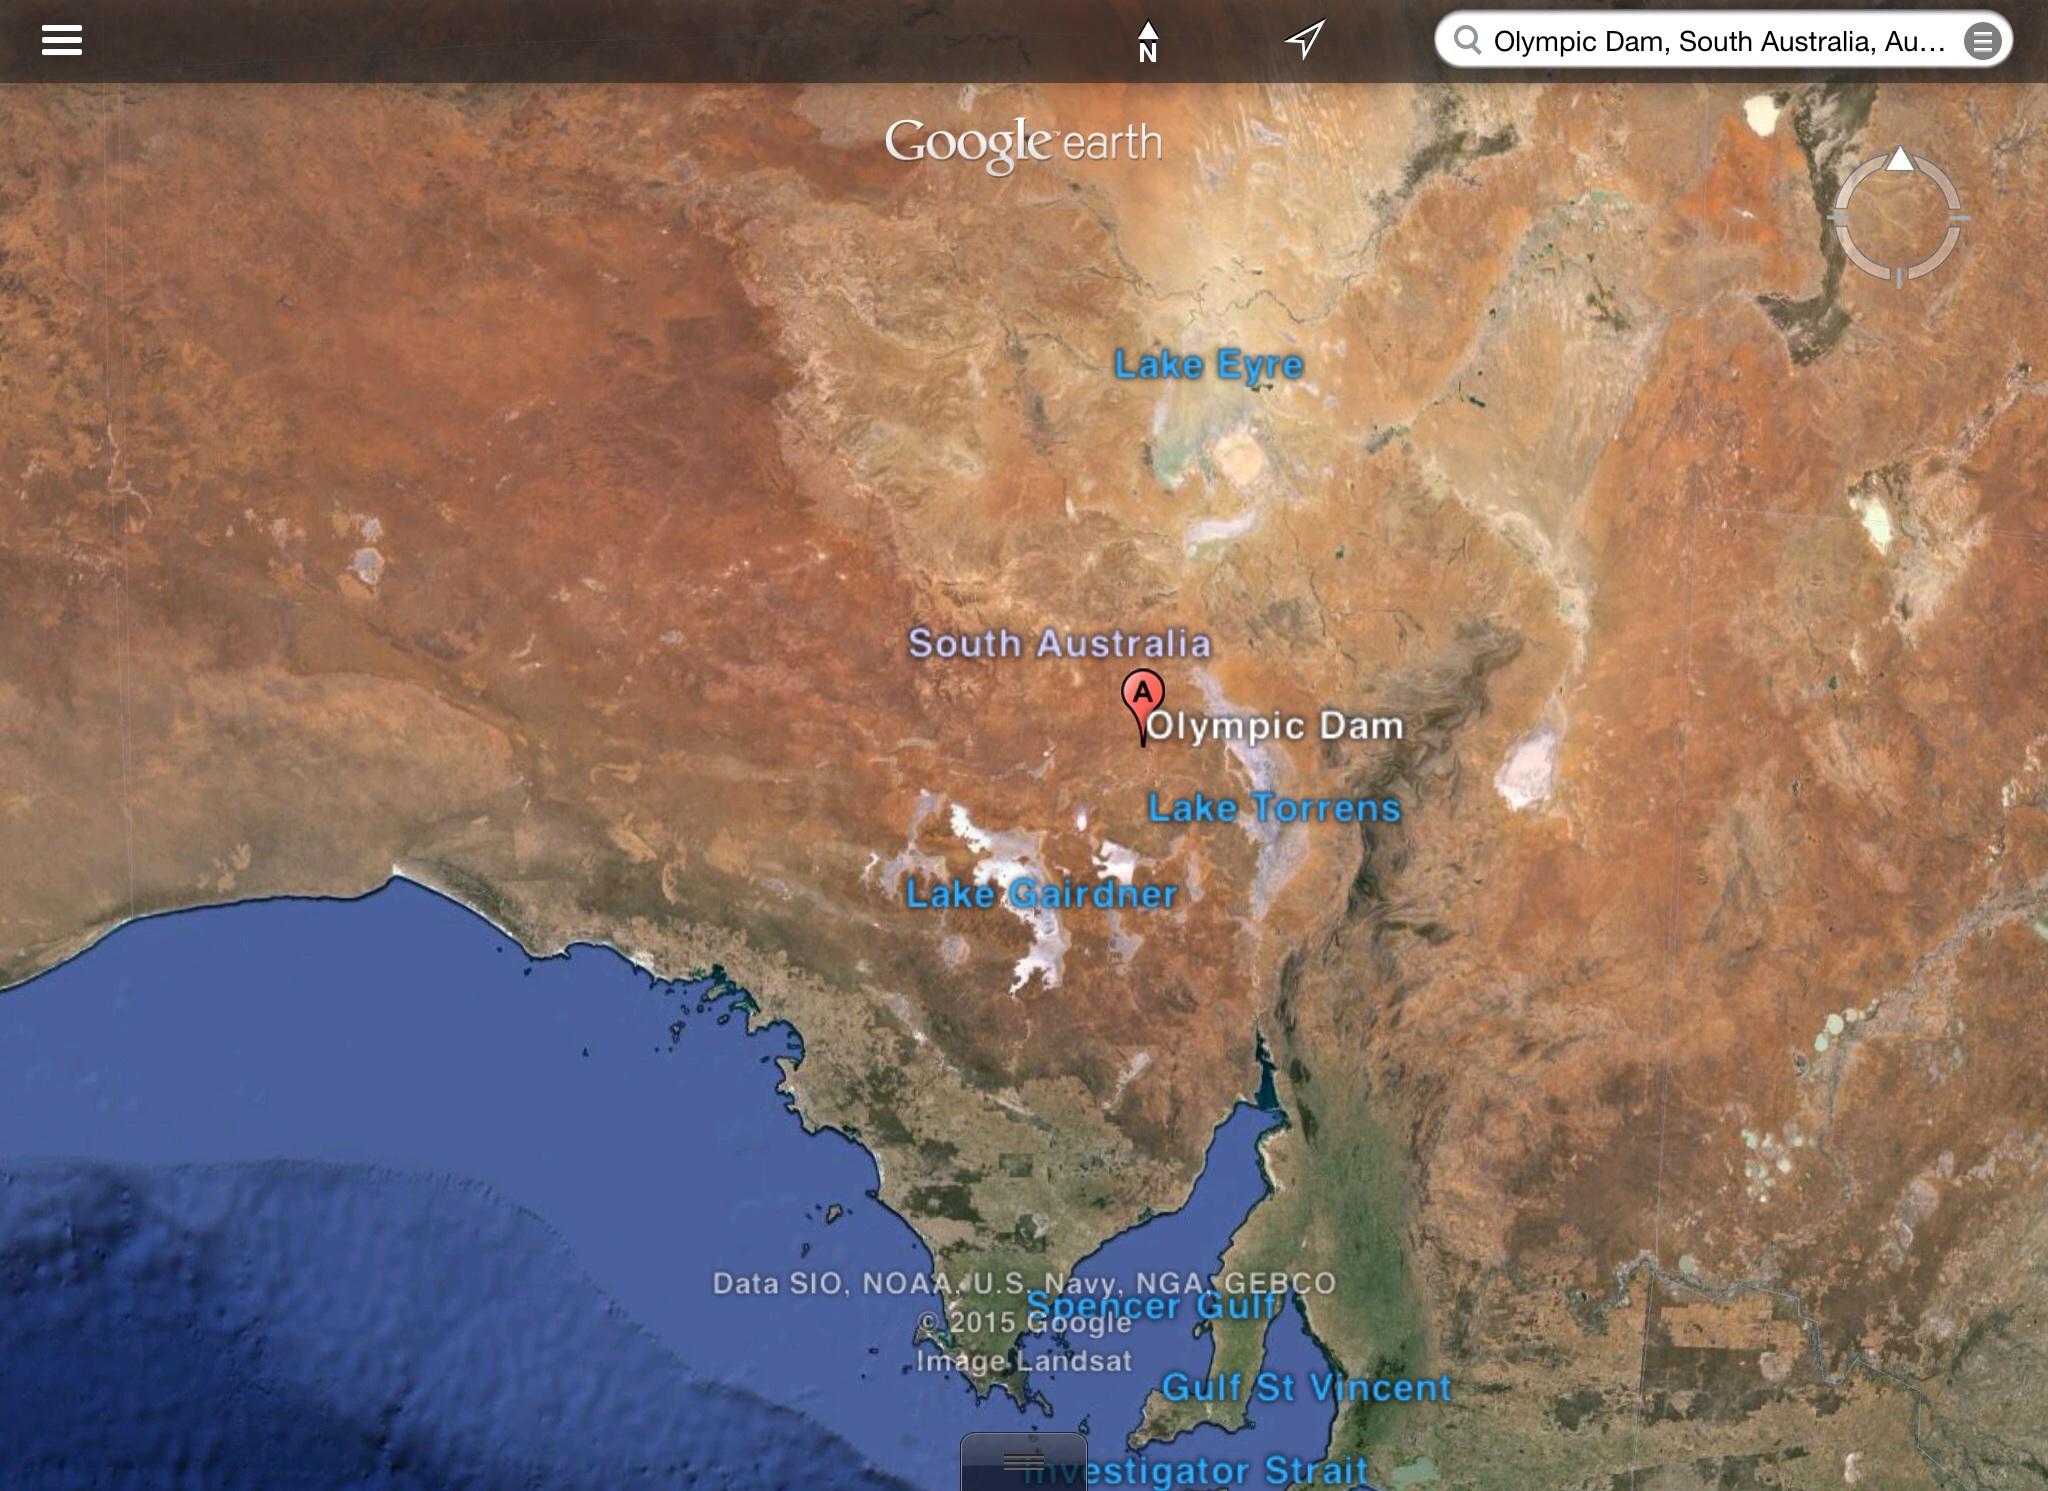 Olympic Dam Mine: Largest User of Energy in S  Australia